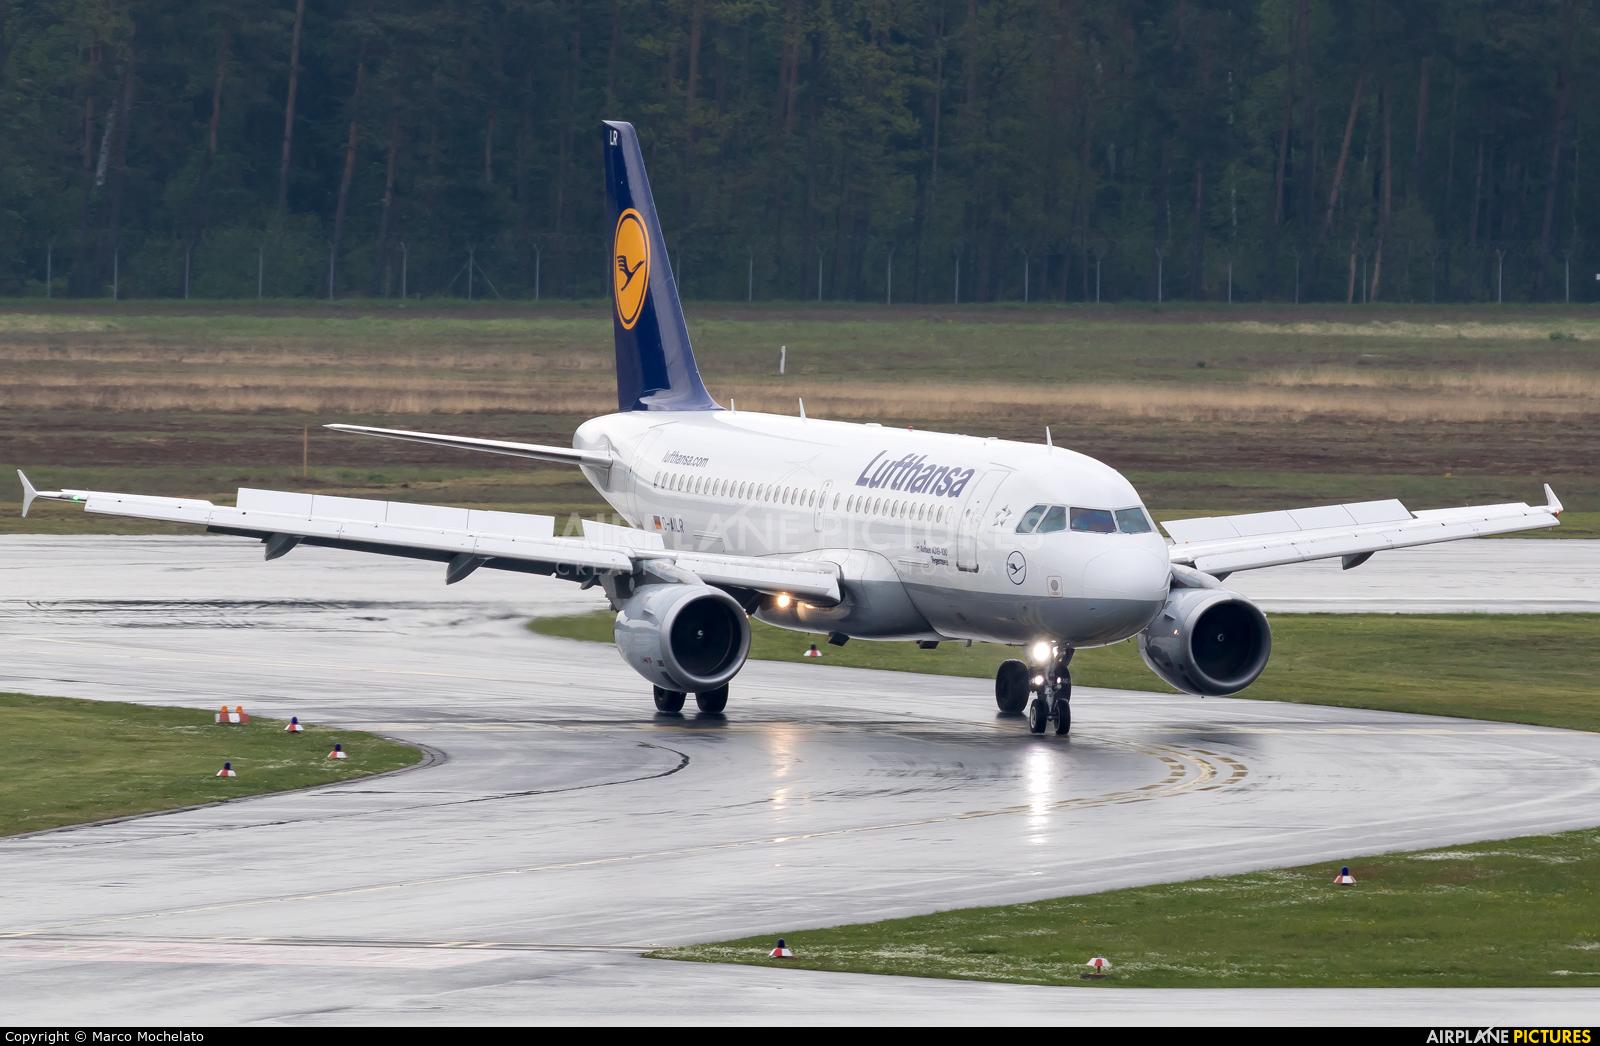 Lufthansa D-AILR aircraft at Nuremberg